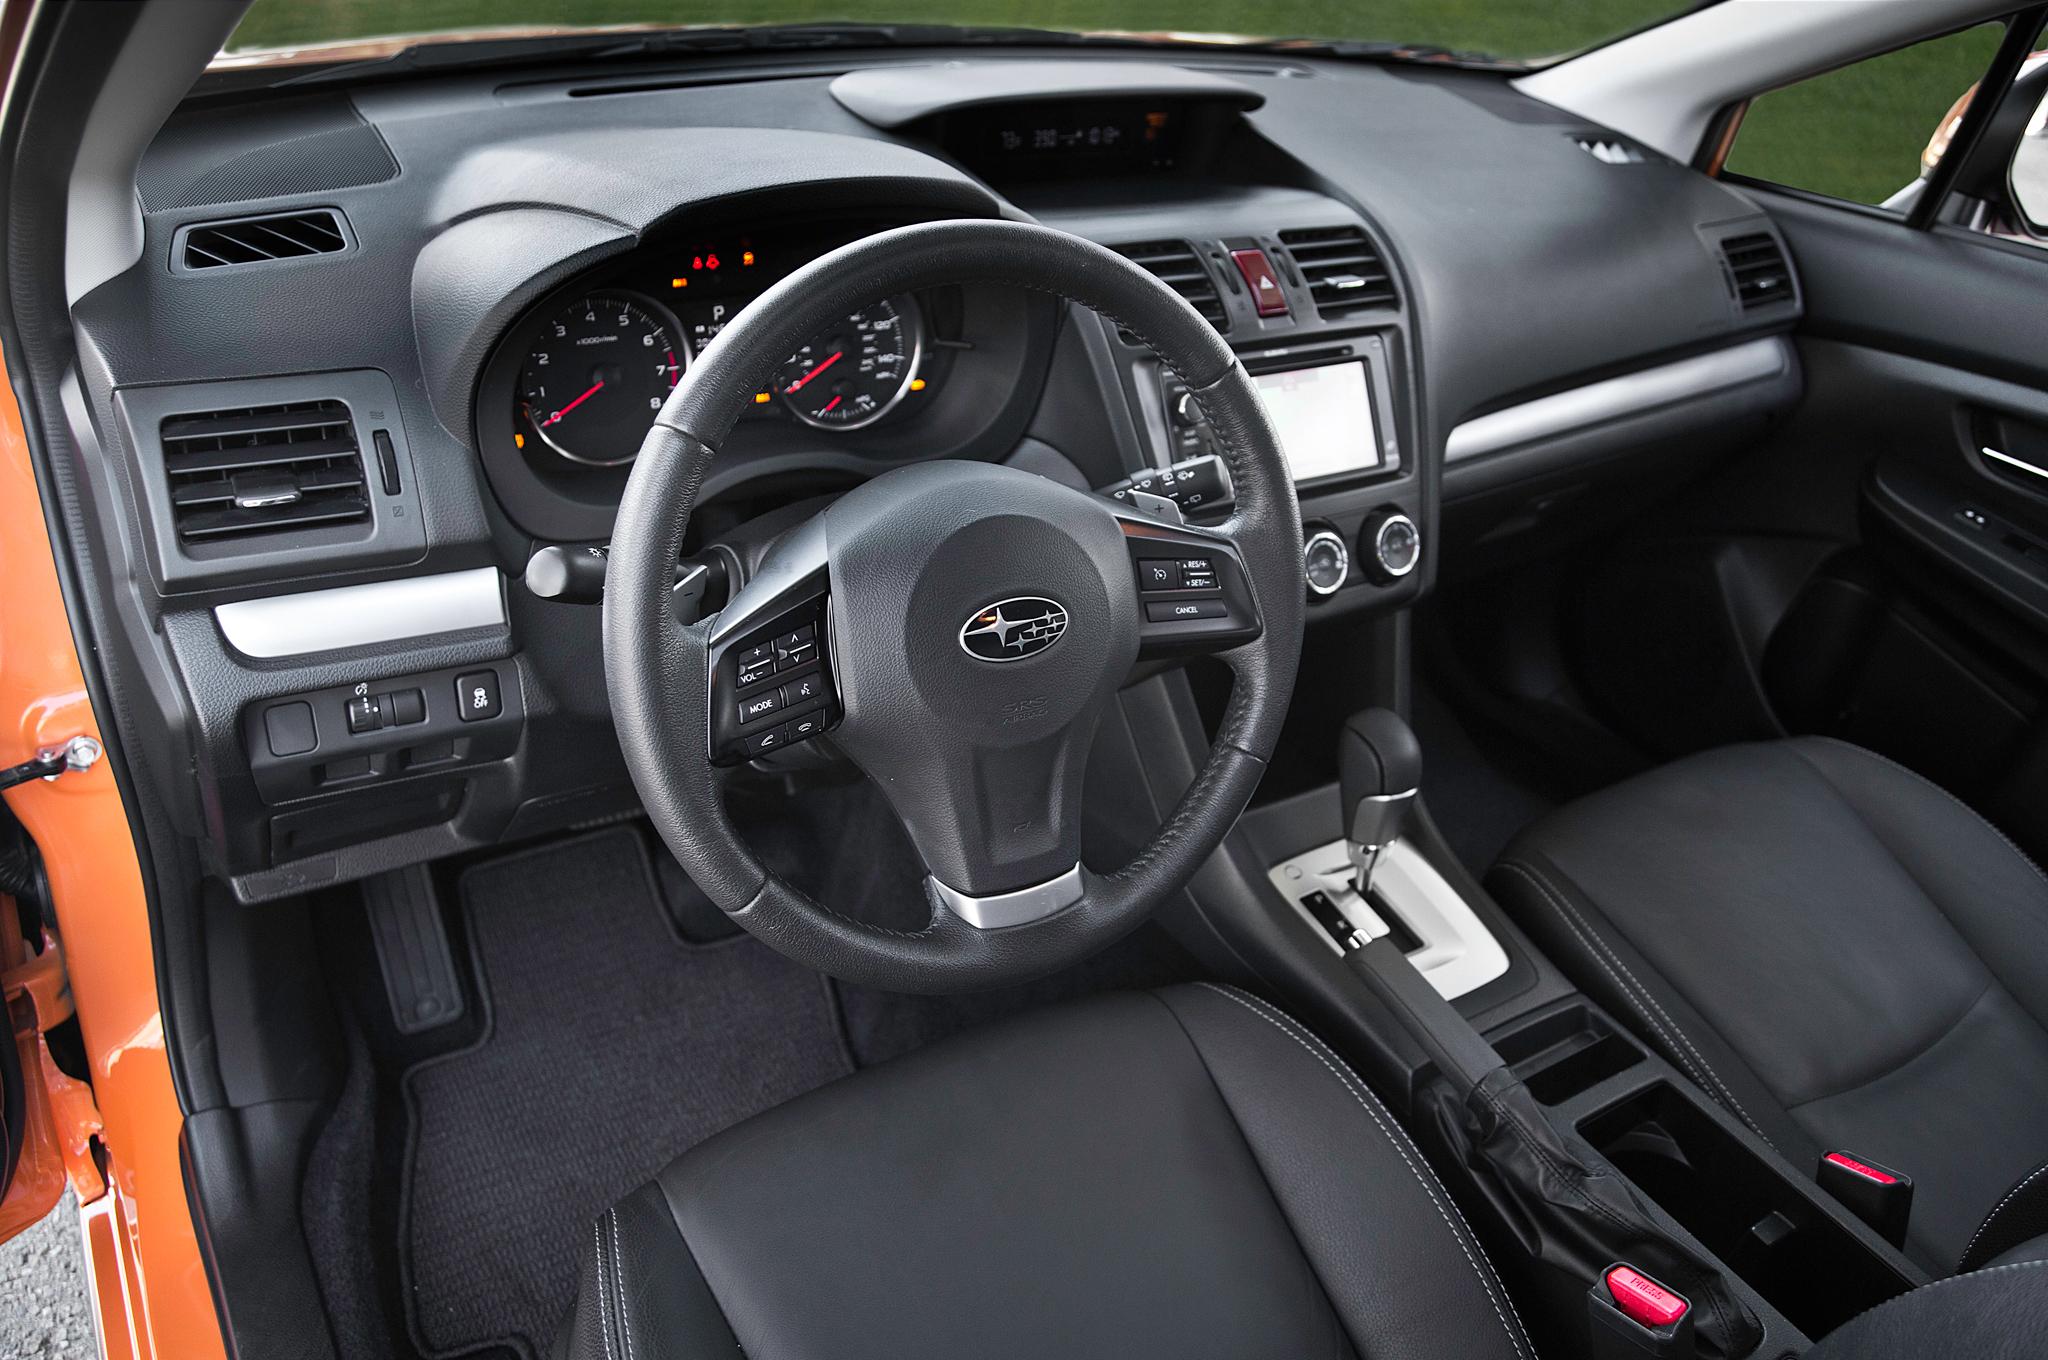 2014 Subaru Xv Crosstrek 2.0I Limited >> 2014 Subaru Xv Crosstrek 2 0i Limited Auto Car Reviews 2019 2020